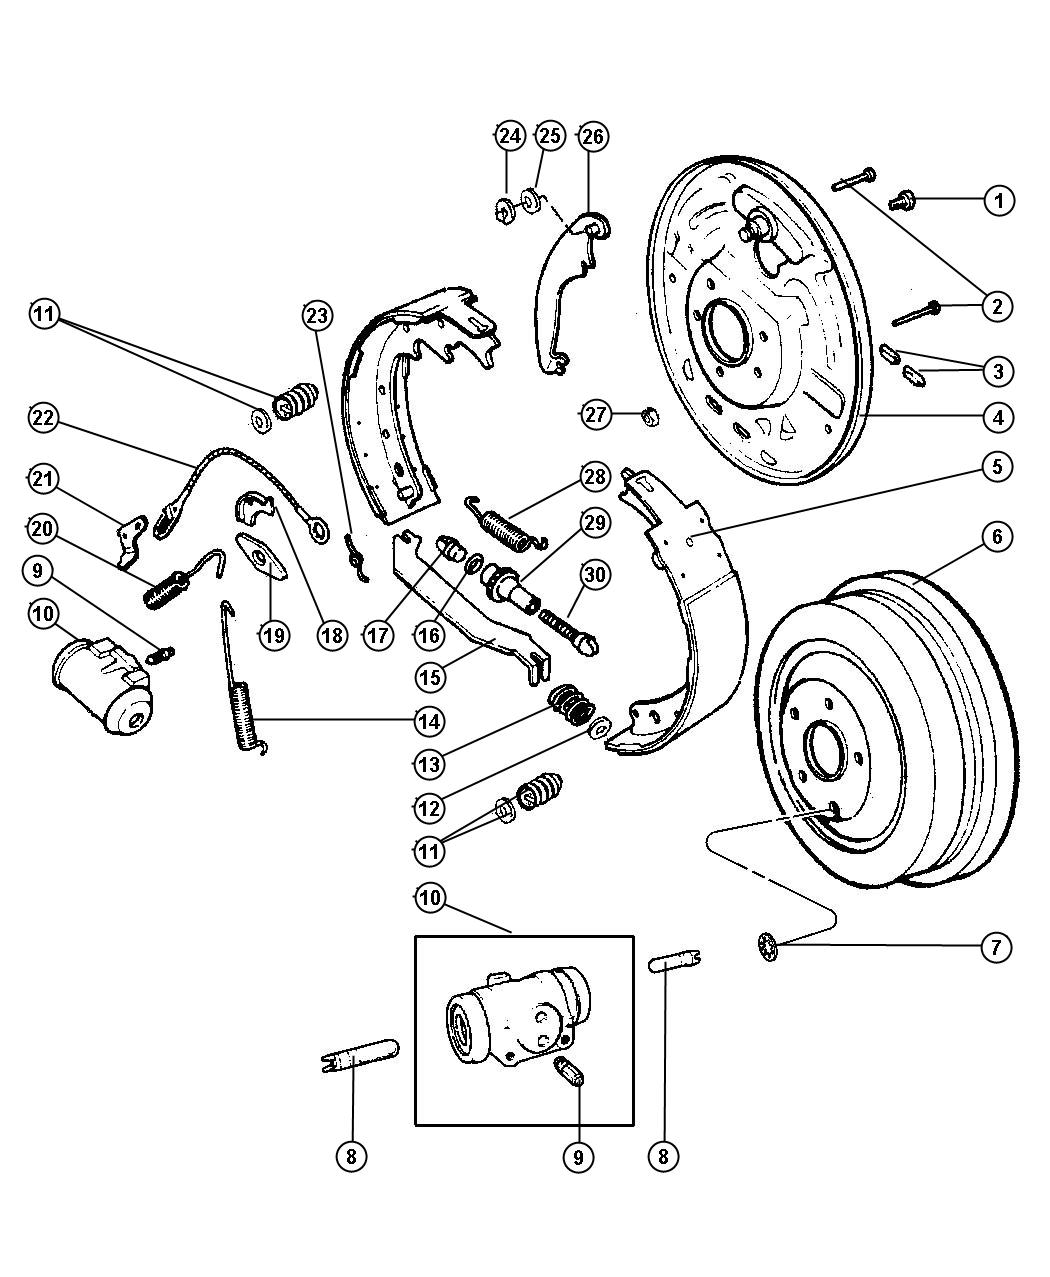 Diagram Wiring Diagram Jeep Liberty Espa Ol Full